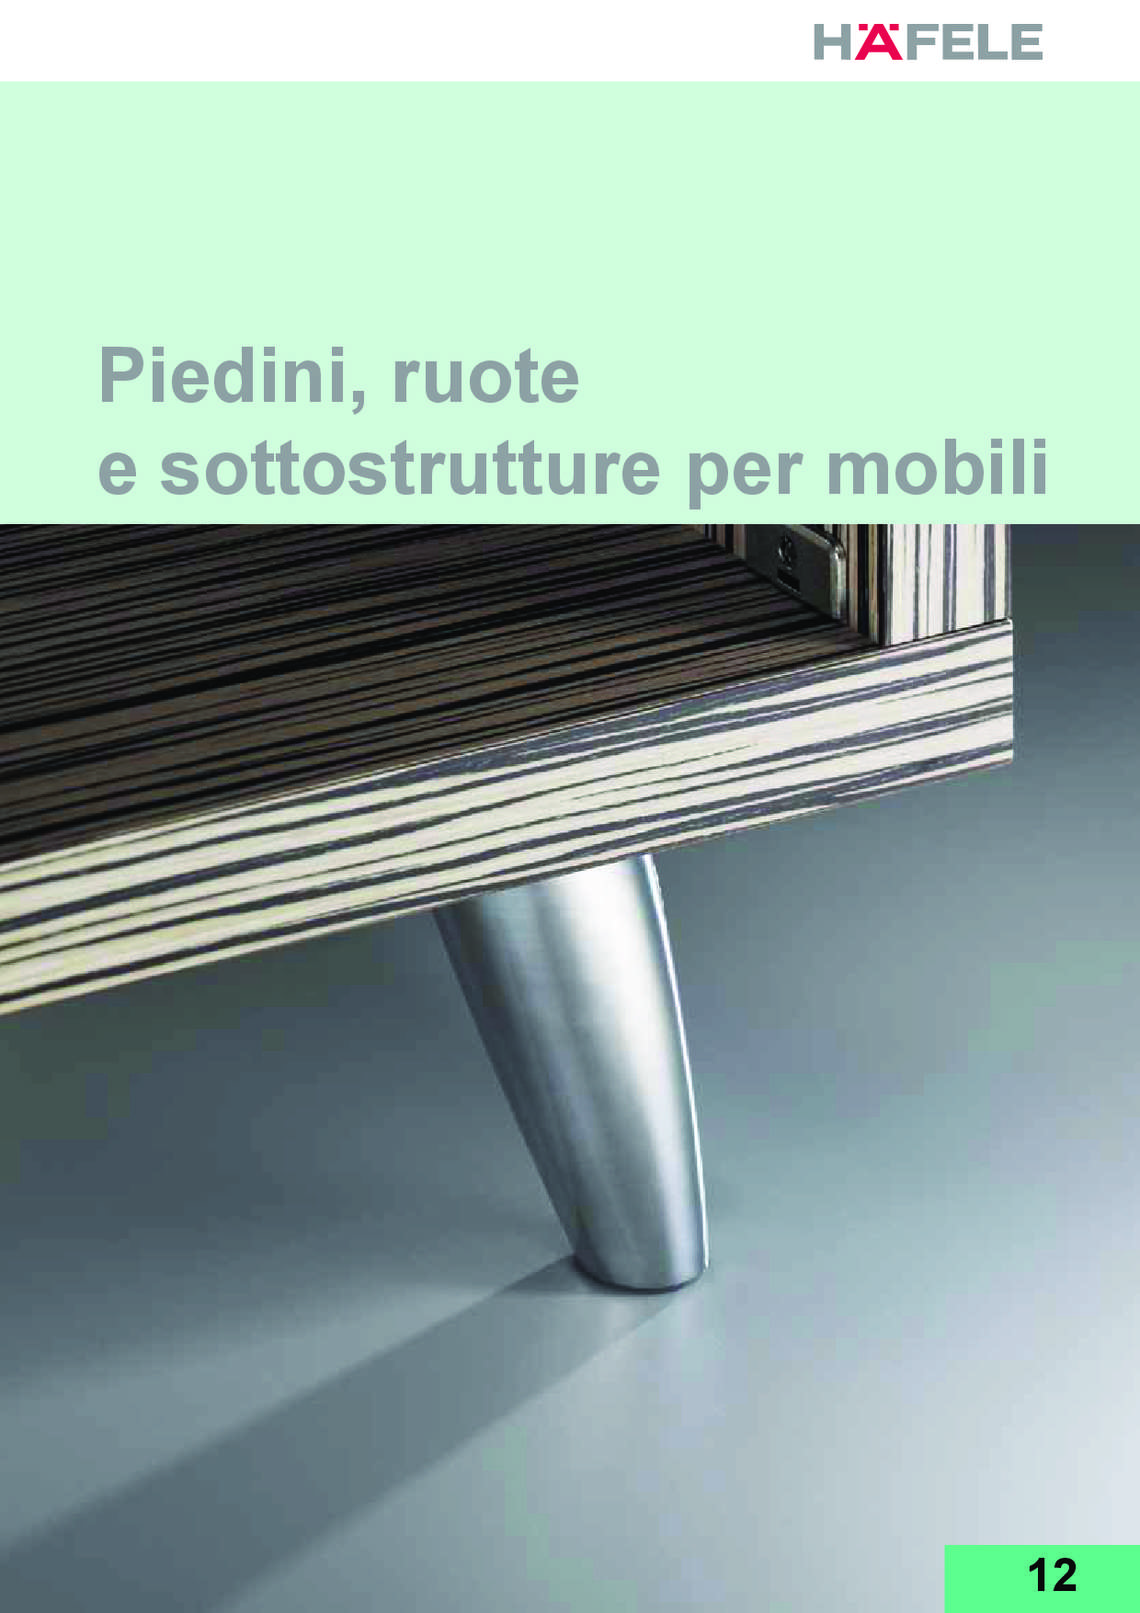 hafele-sottostrutture-per-mobili_83_010.jpg